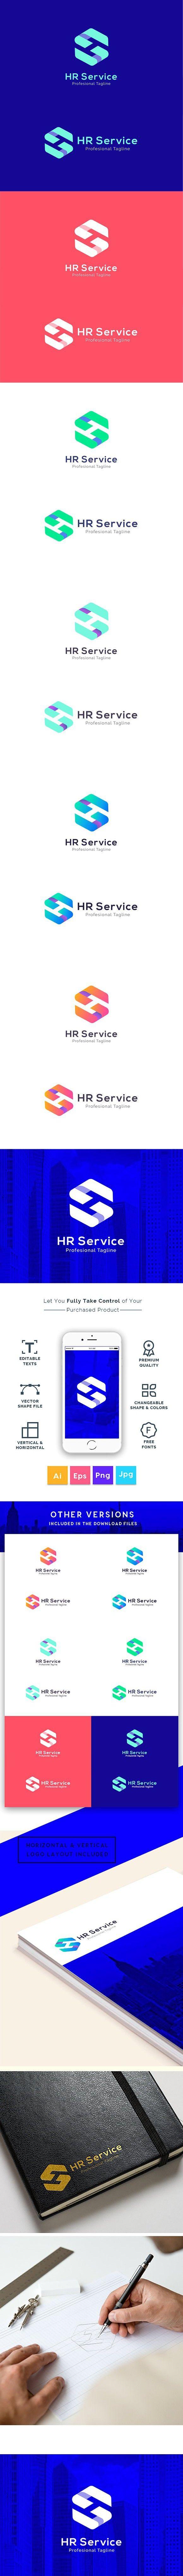 HR Service - H S Letter Logo #humanresource